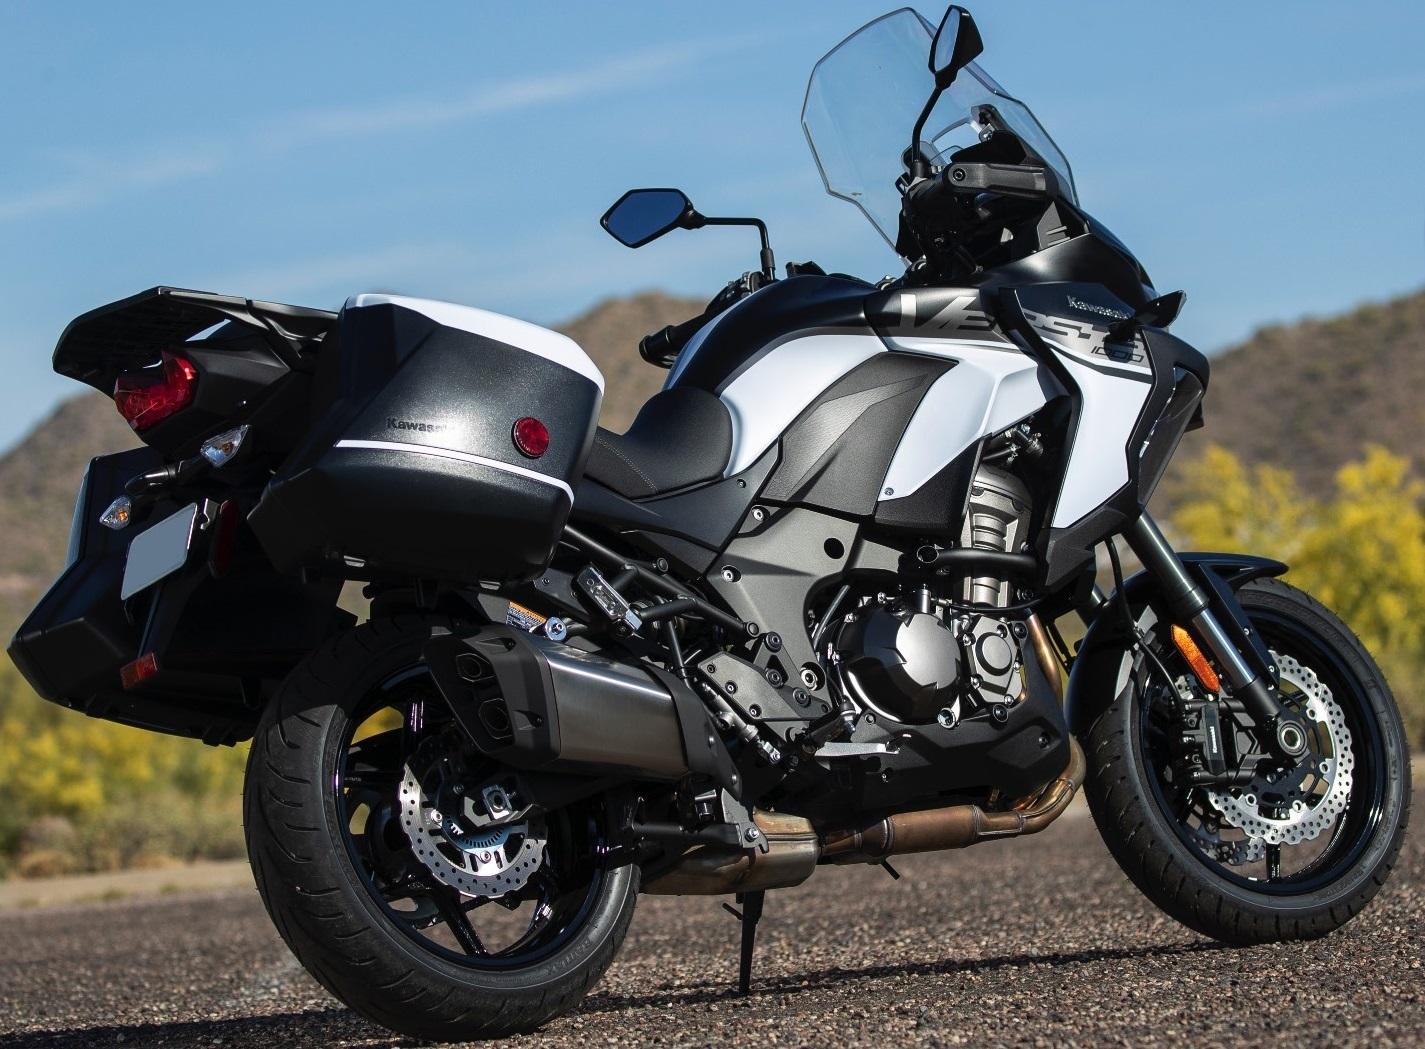 Kawasaki Versys 1000 (KLE 1000, KLZ 1000)